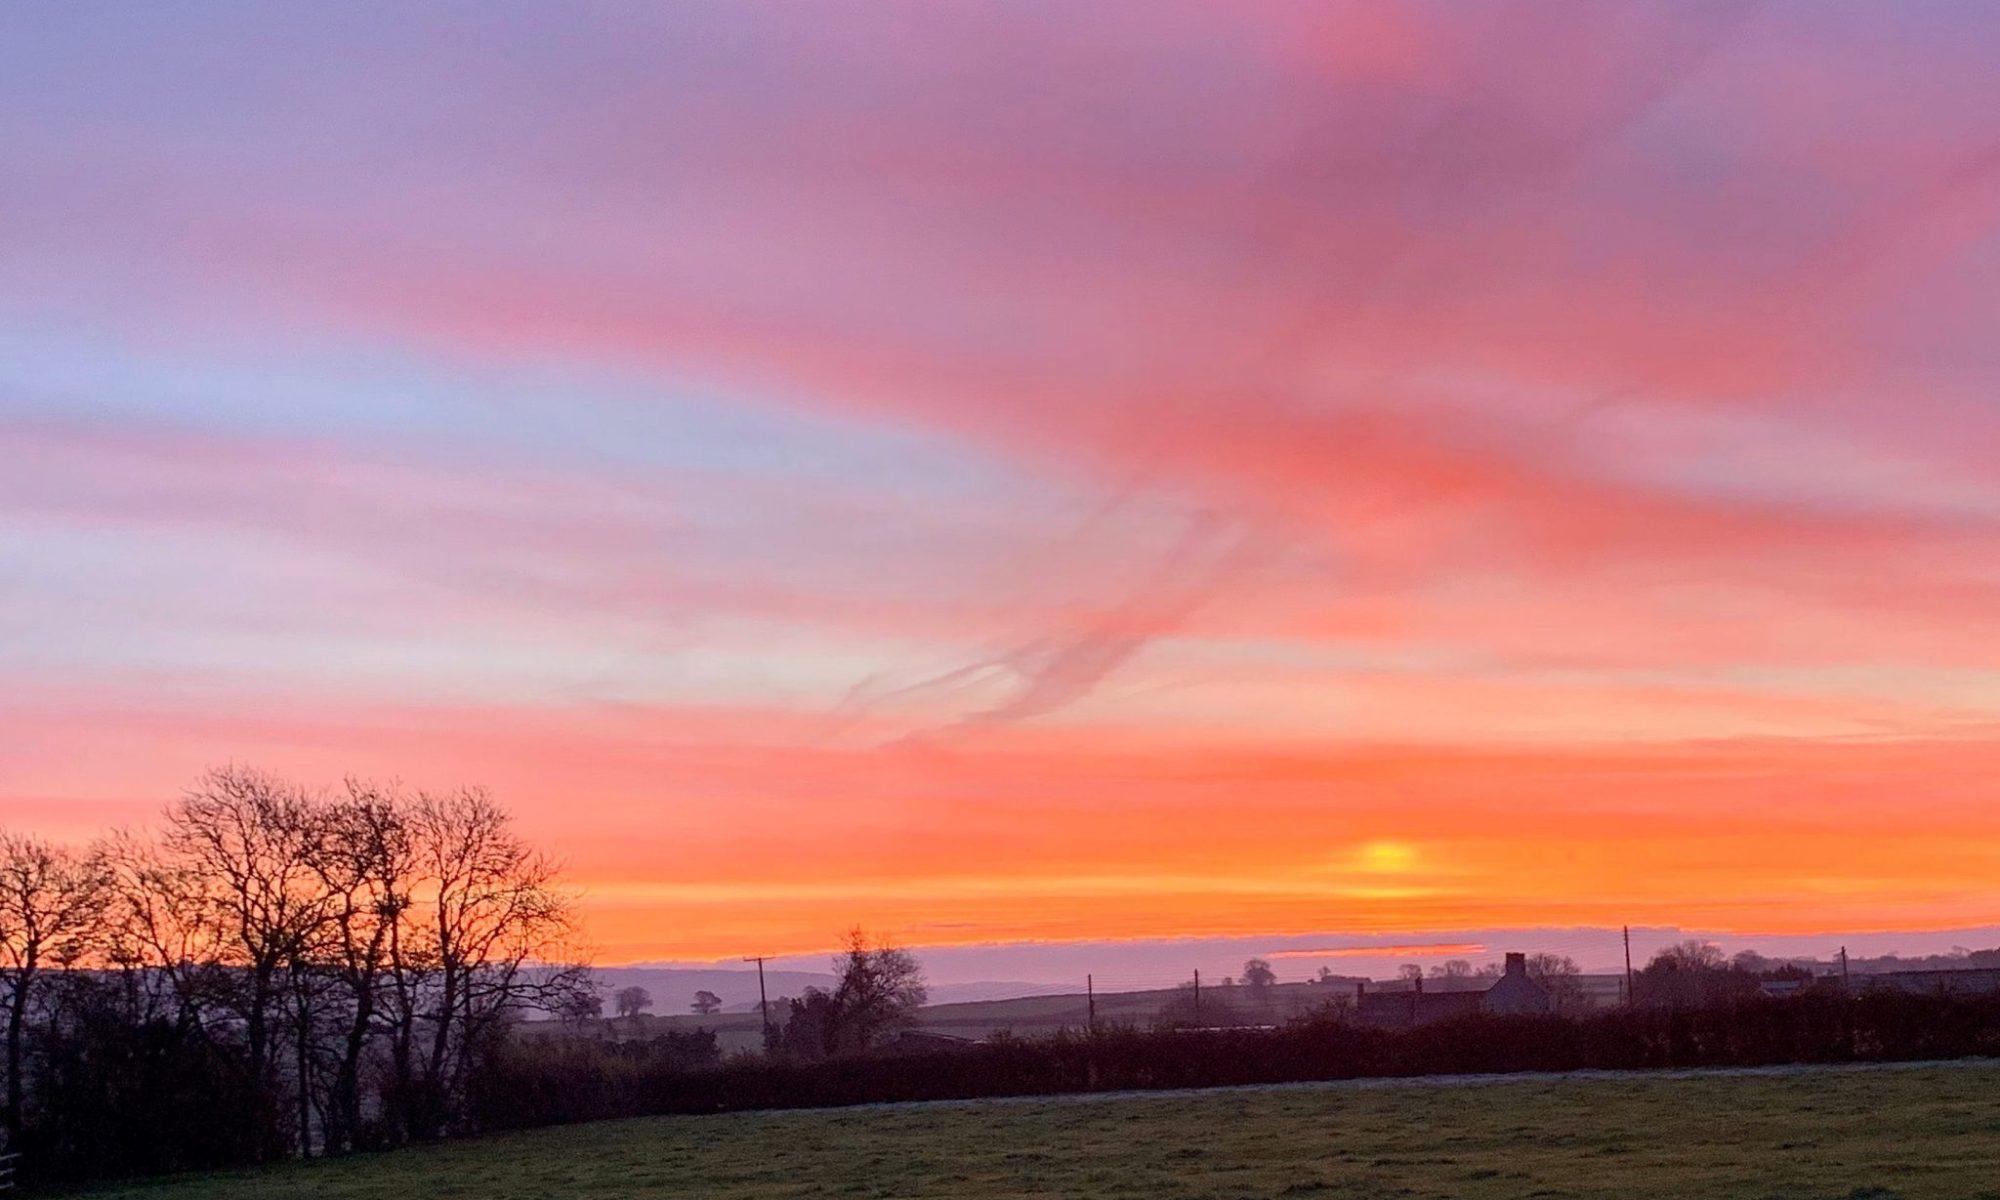 Sunrise 7.18am